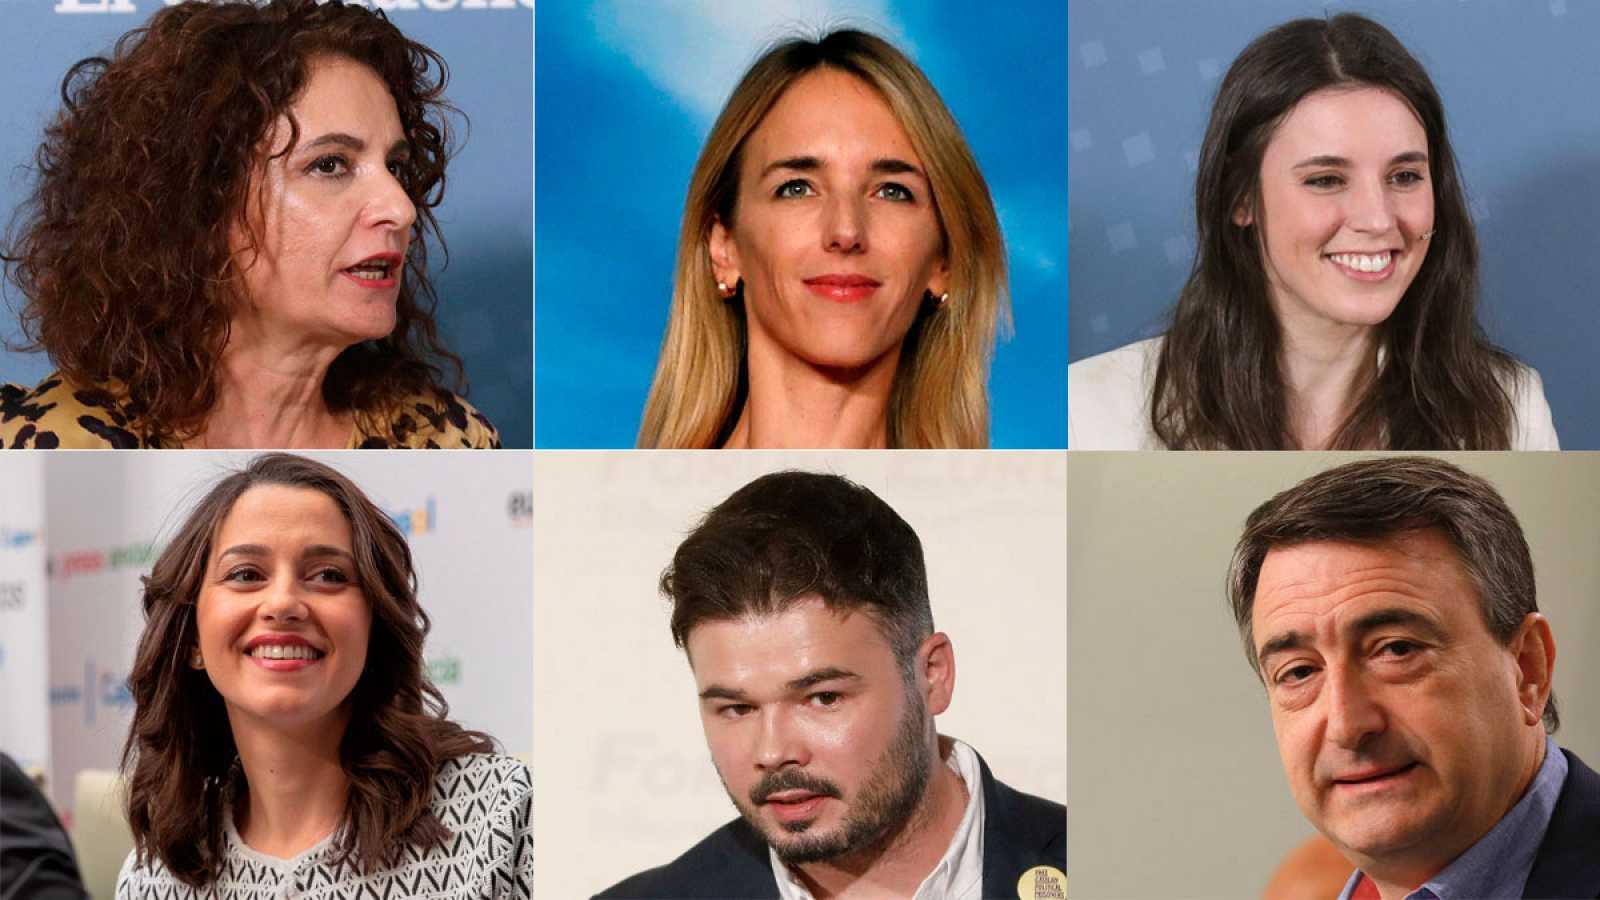 Debate a seis en RTVE con Álvarez de Toledo, María Jesús Montero, Irene Montero, Arrimadas, Rufián y Aitor Esteban